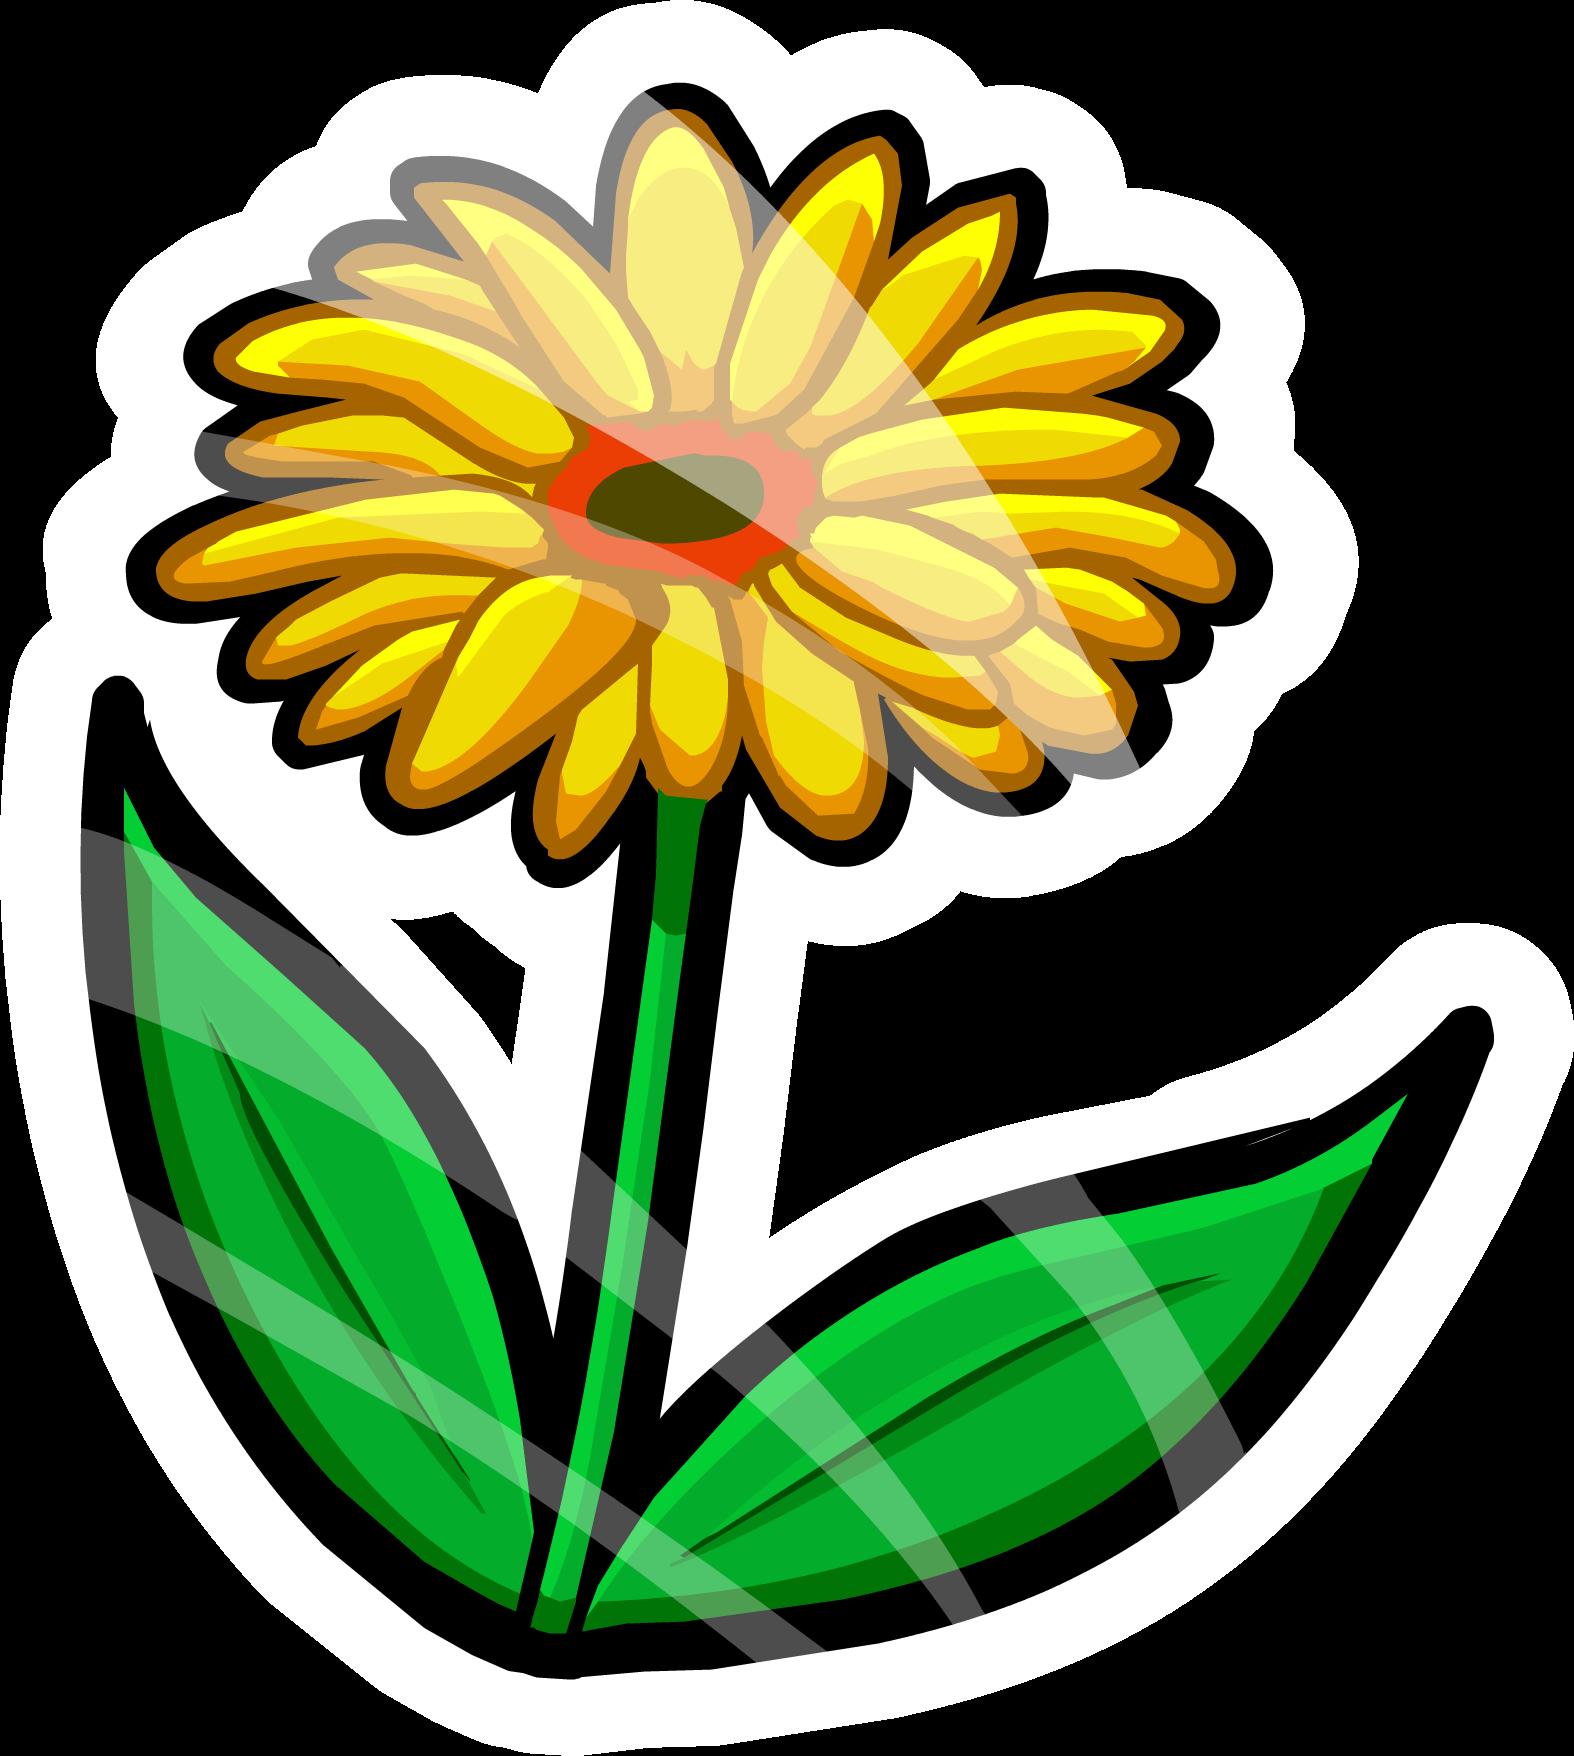 Pin de Flor Primaveral